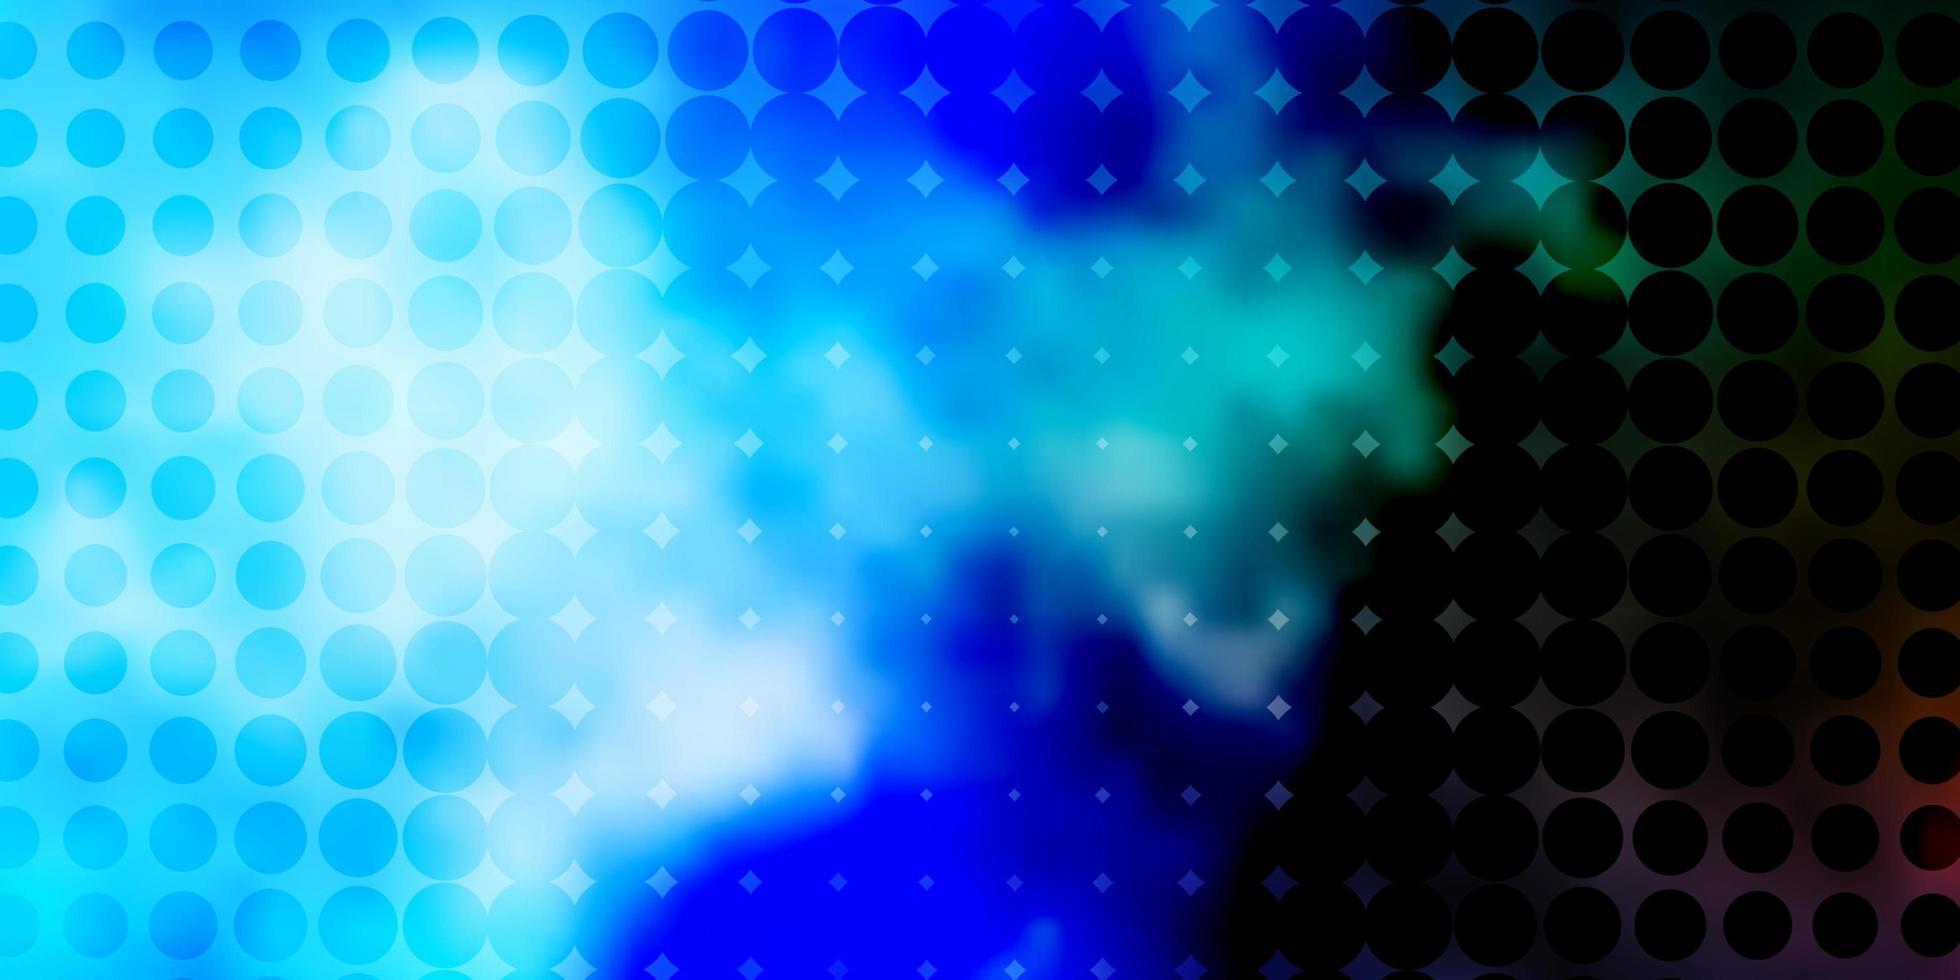 pano de fundo vector azul e verde claro com círculos.